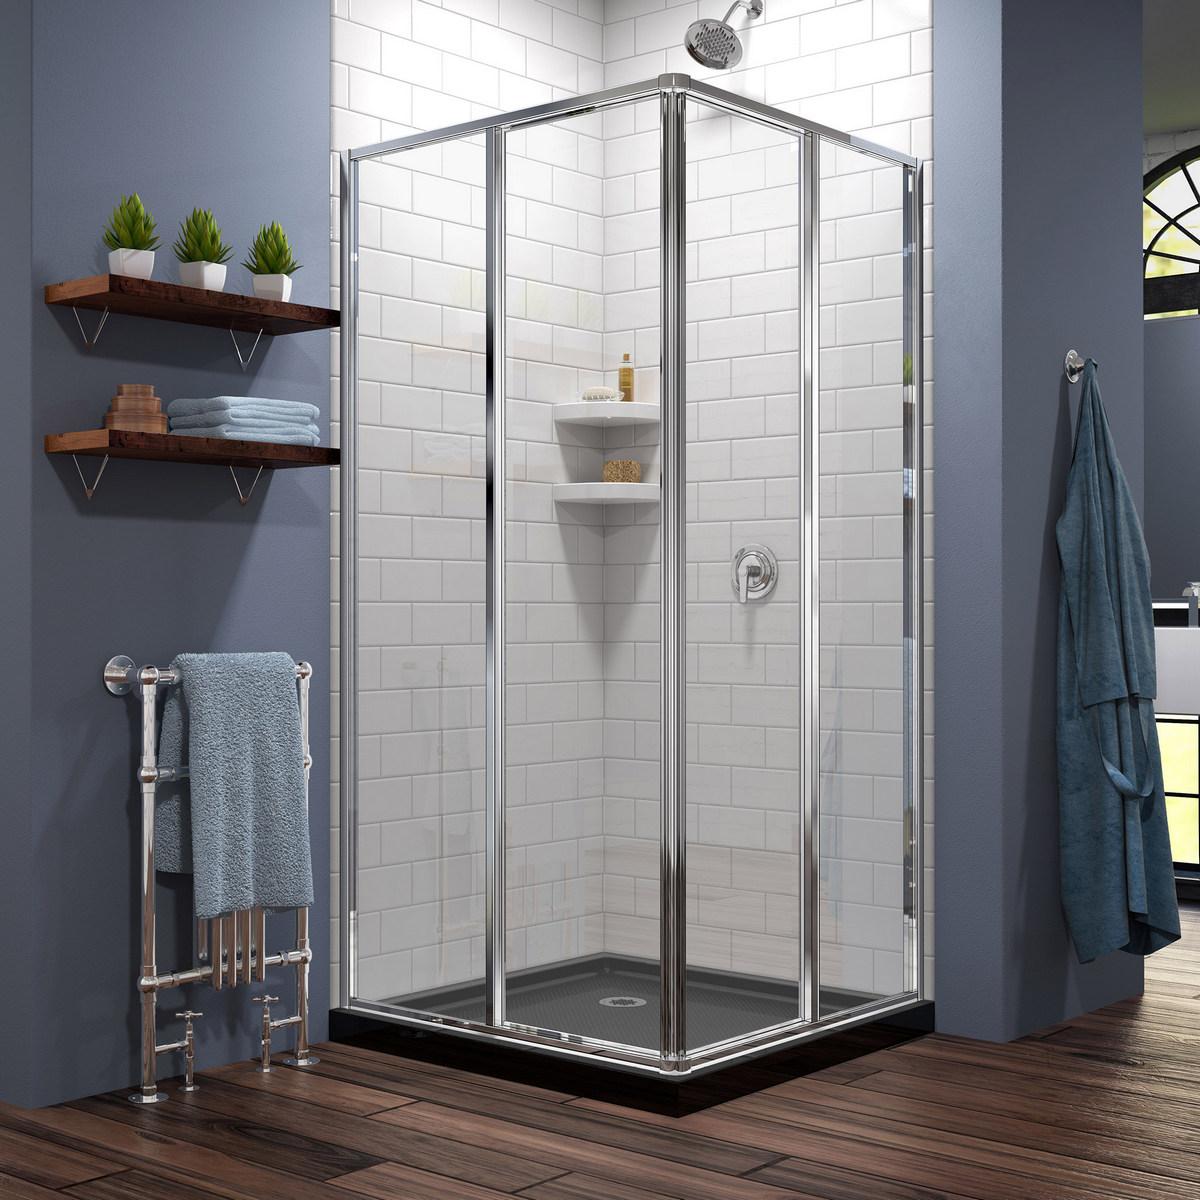 Dreamline Cornerview Sliding Shower Enclosure Chrome Black Acrylic Base Kit